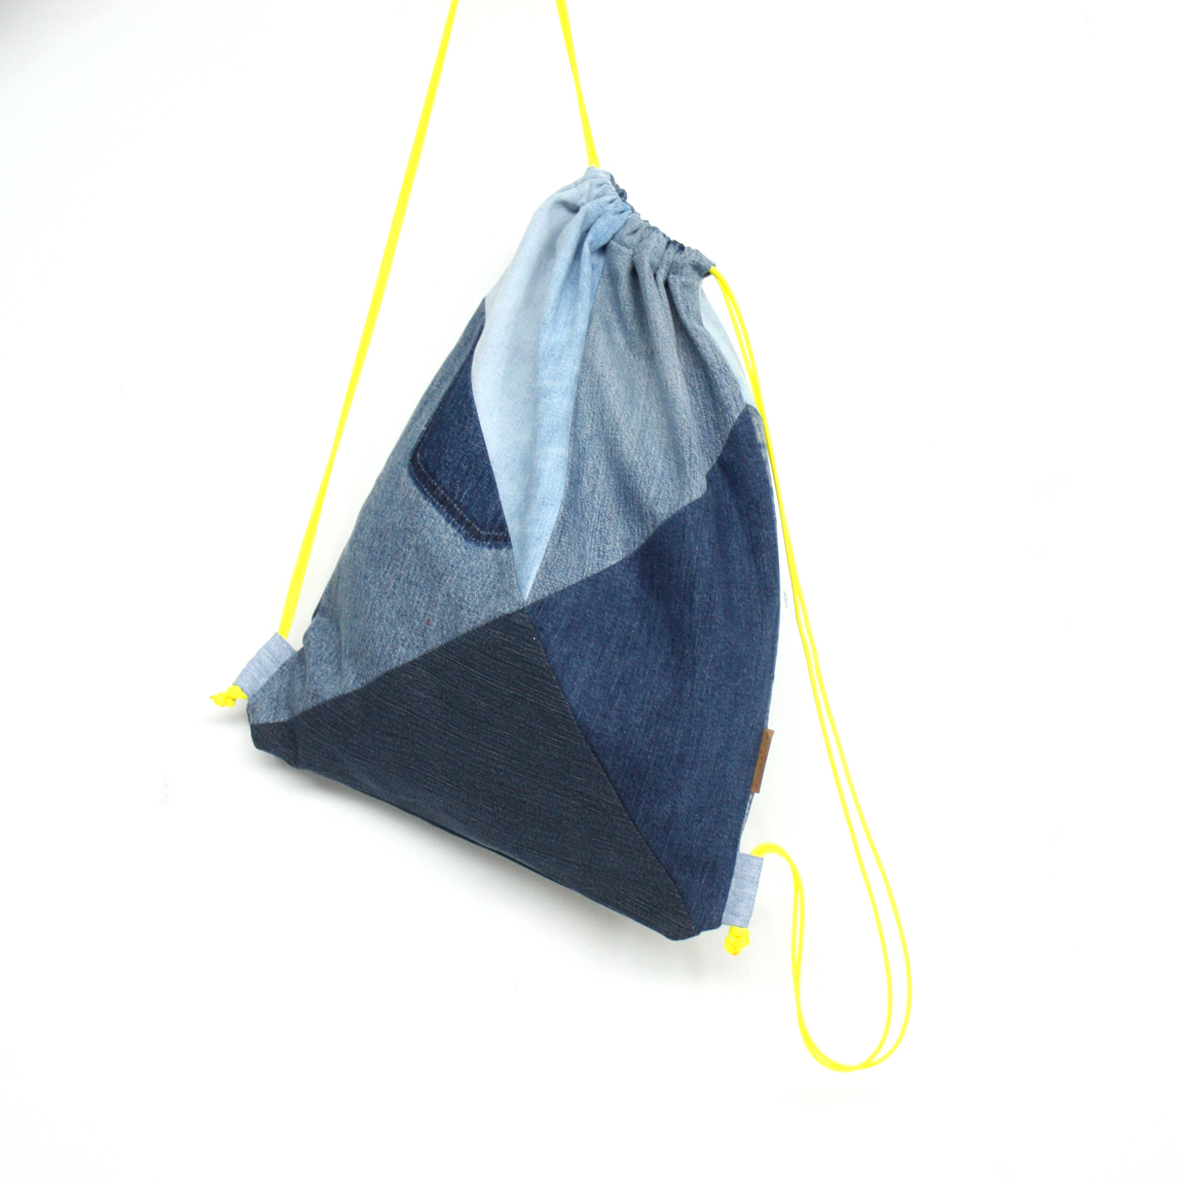 Handmade aus Jeans